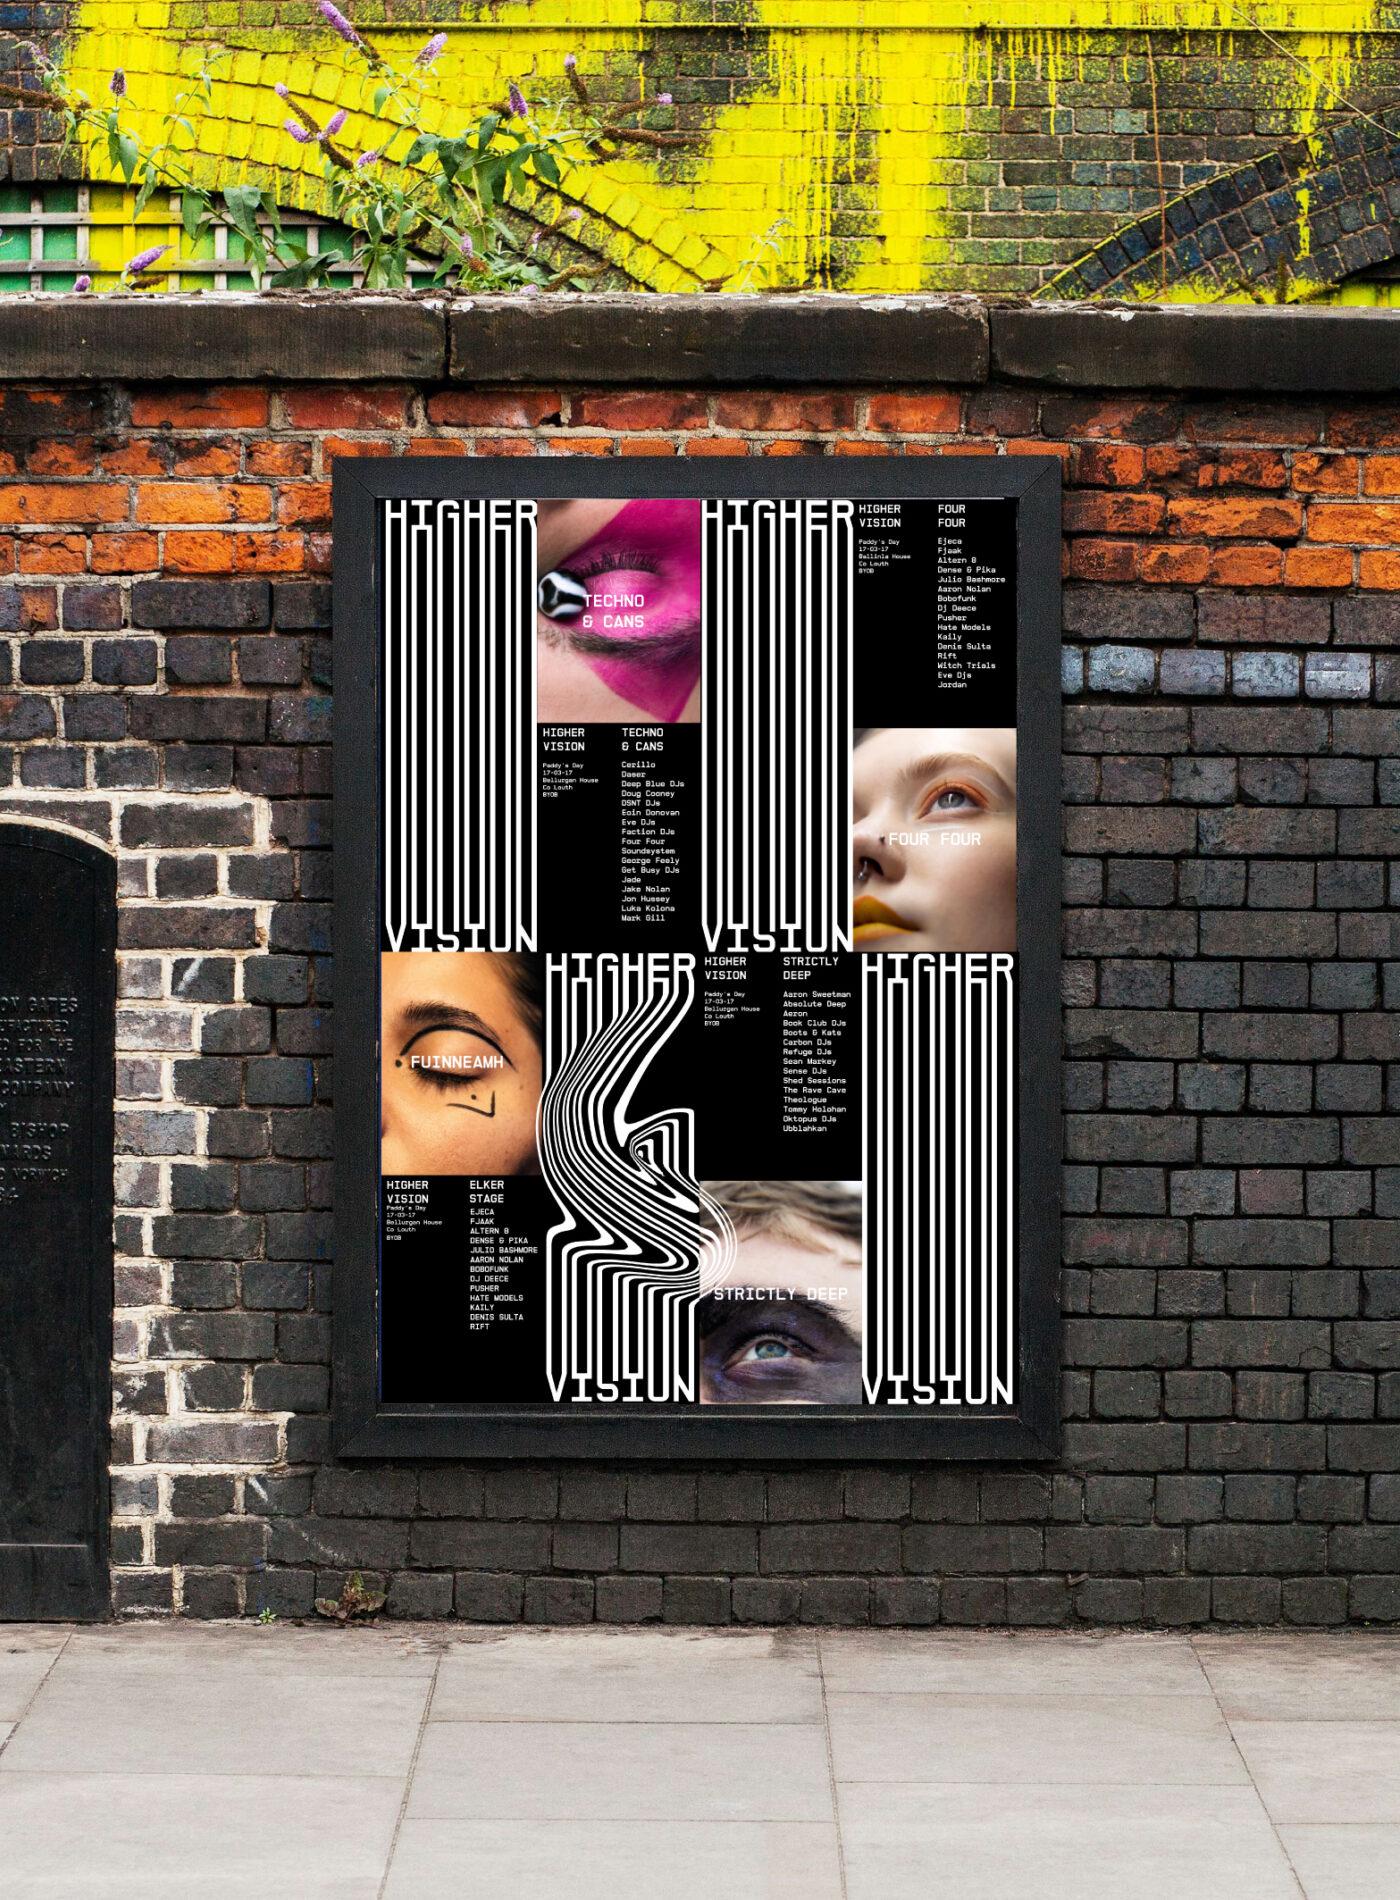 Hv lineup poster ot2